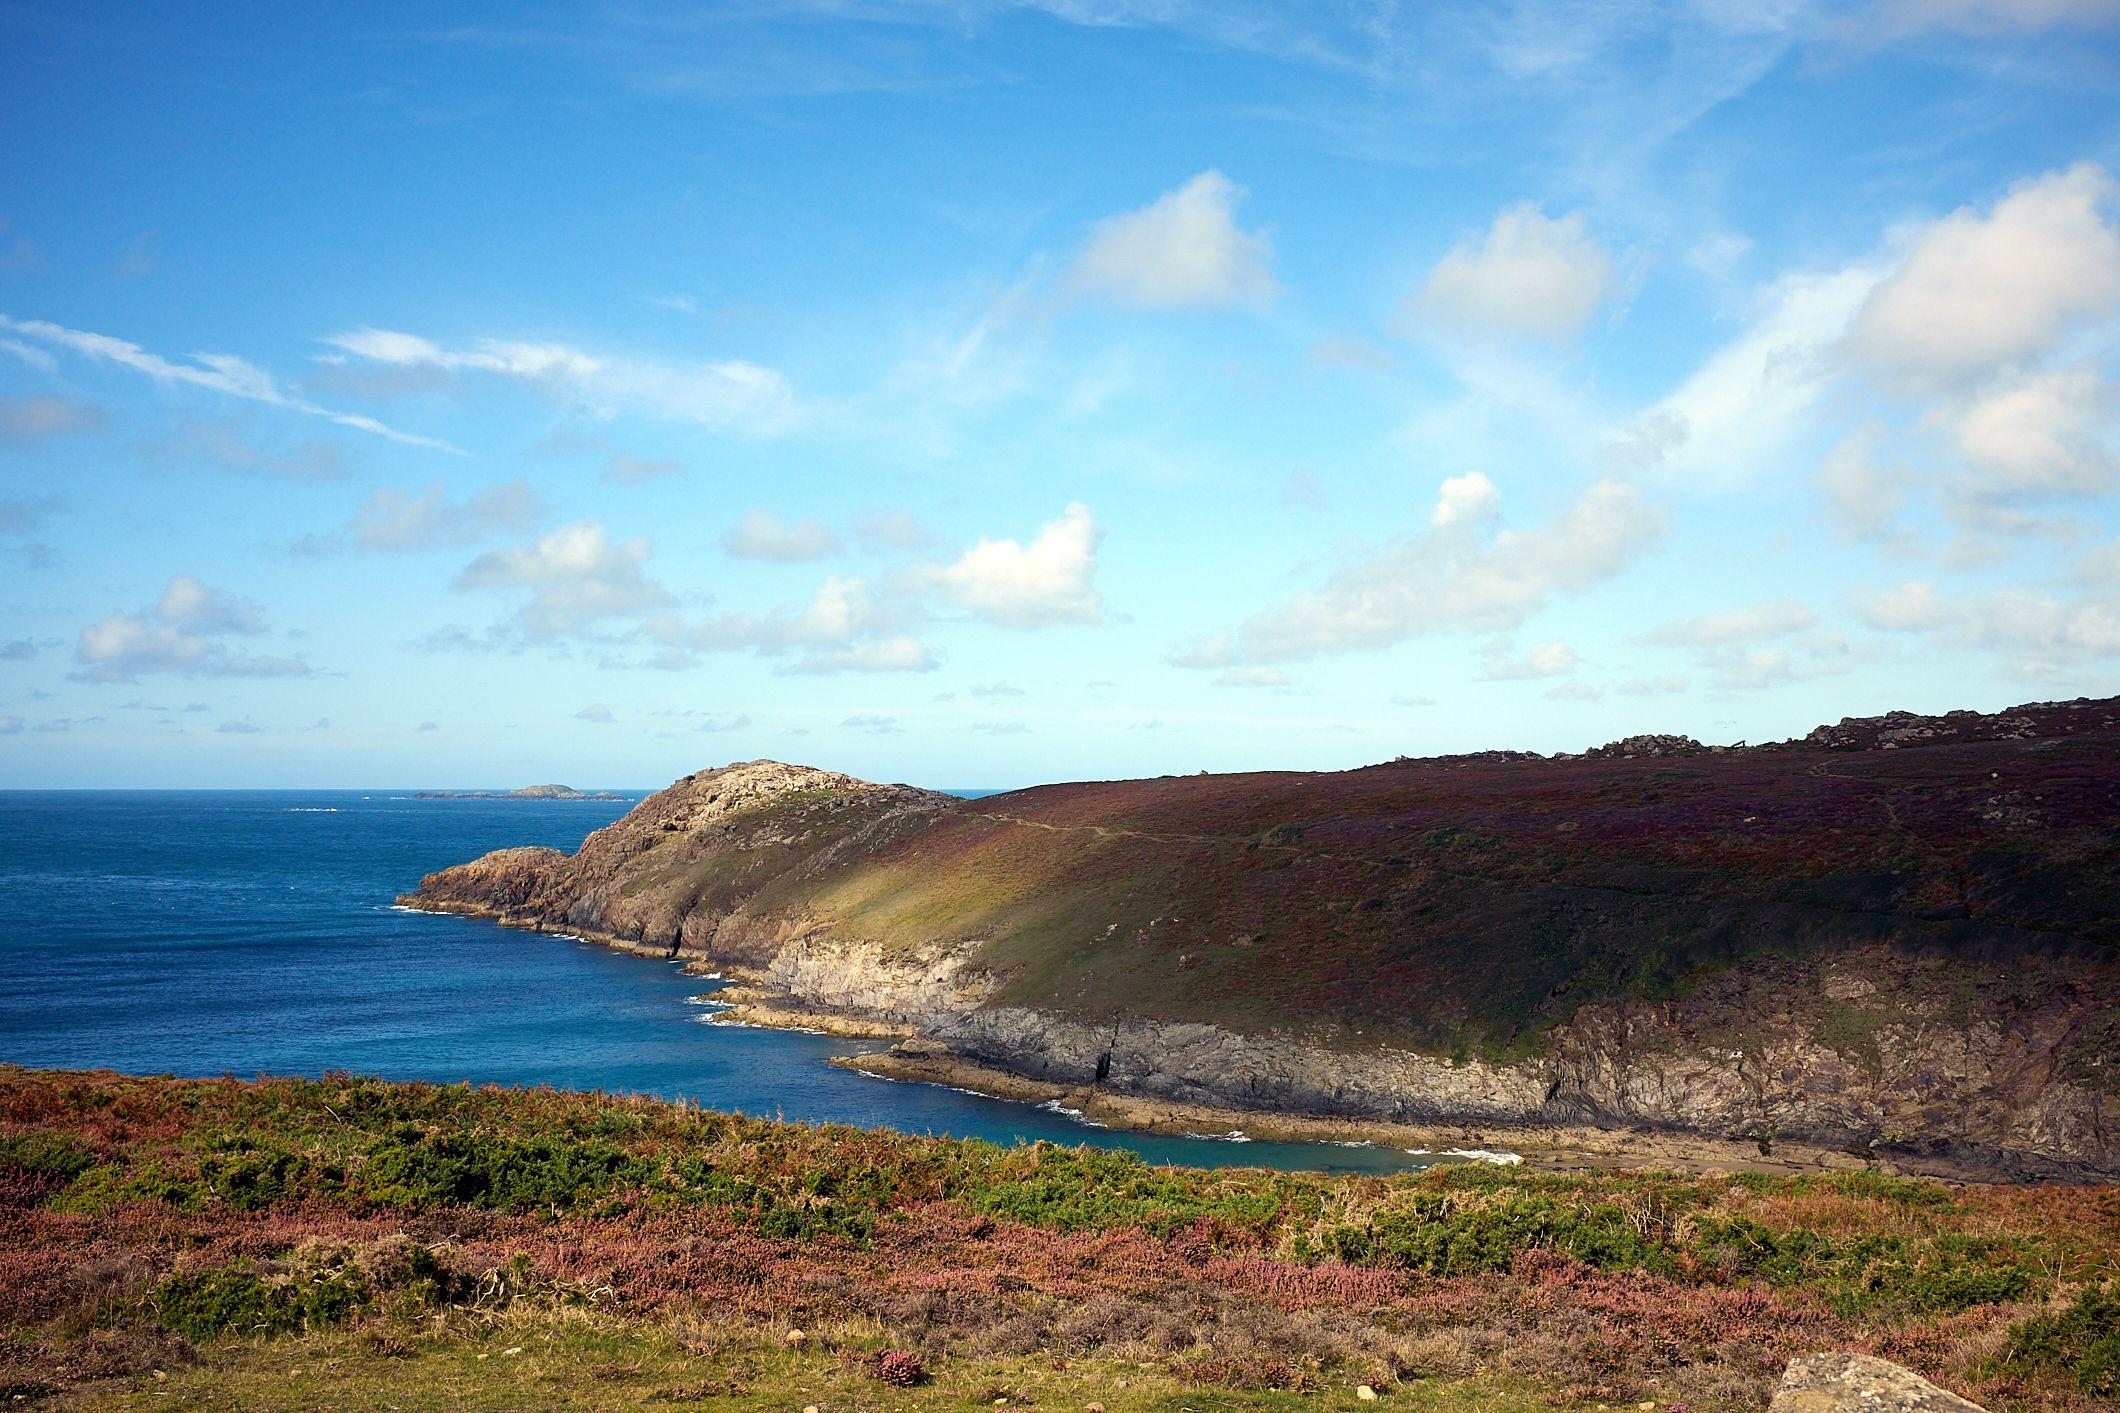 heather coloured headland